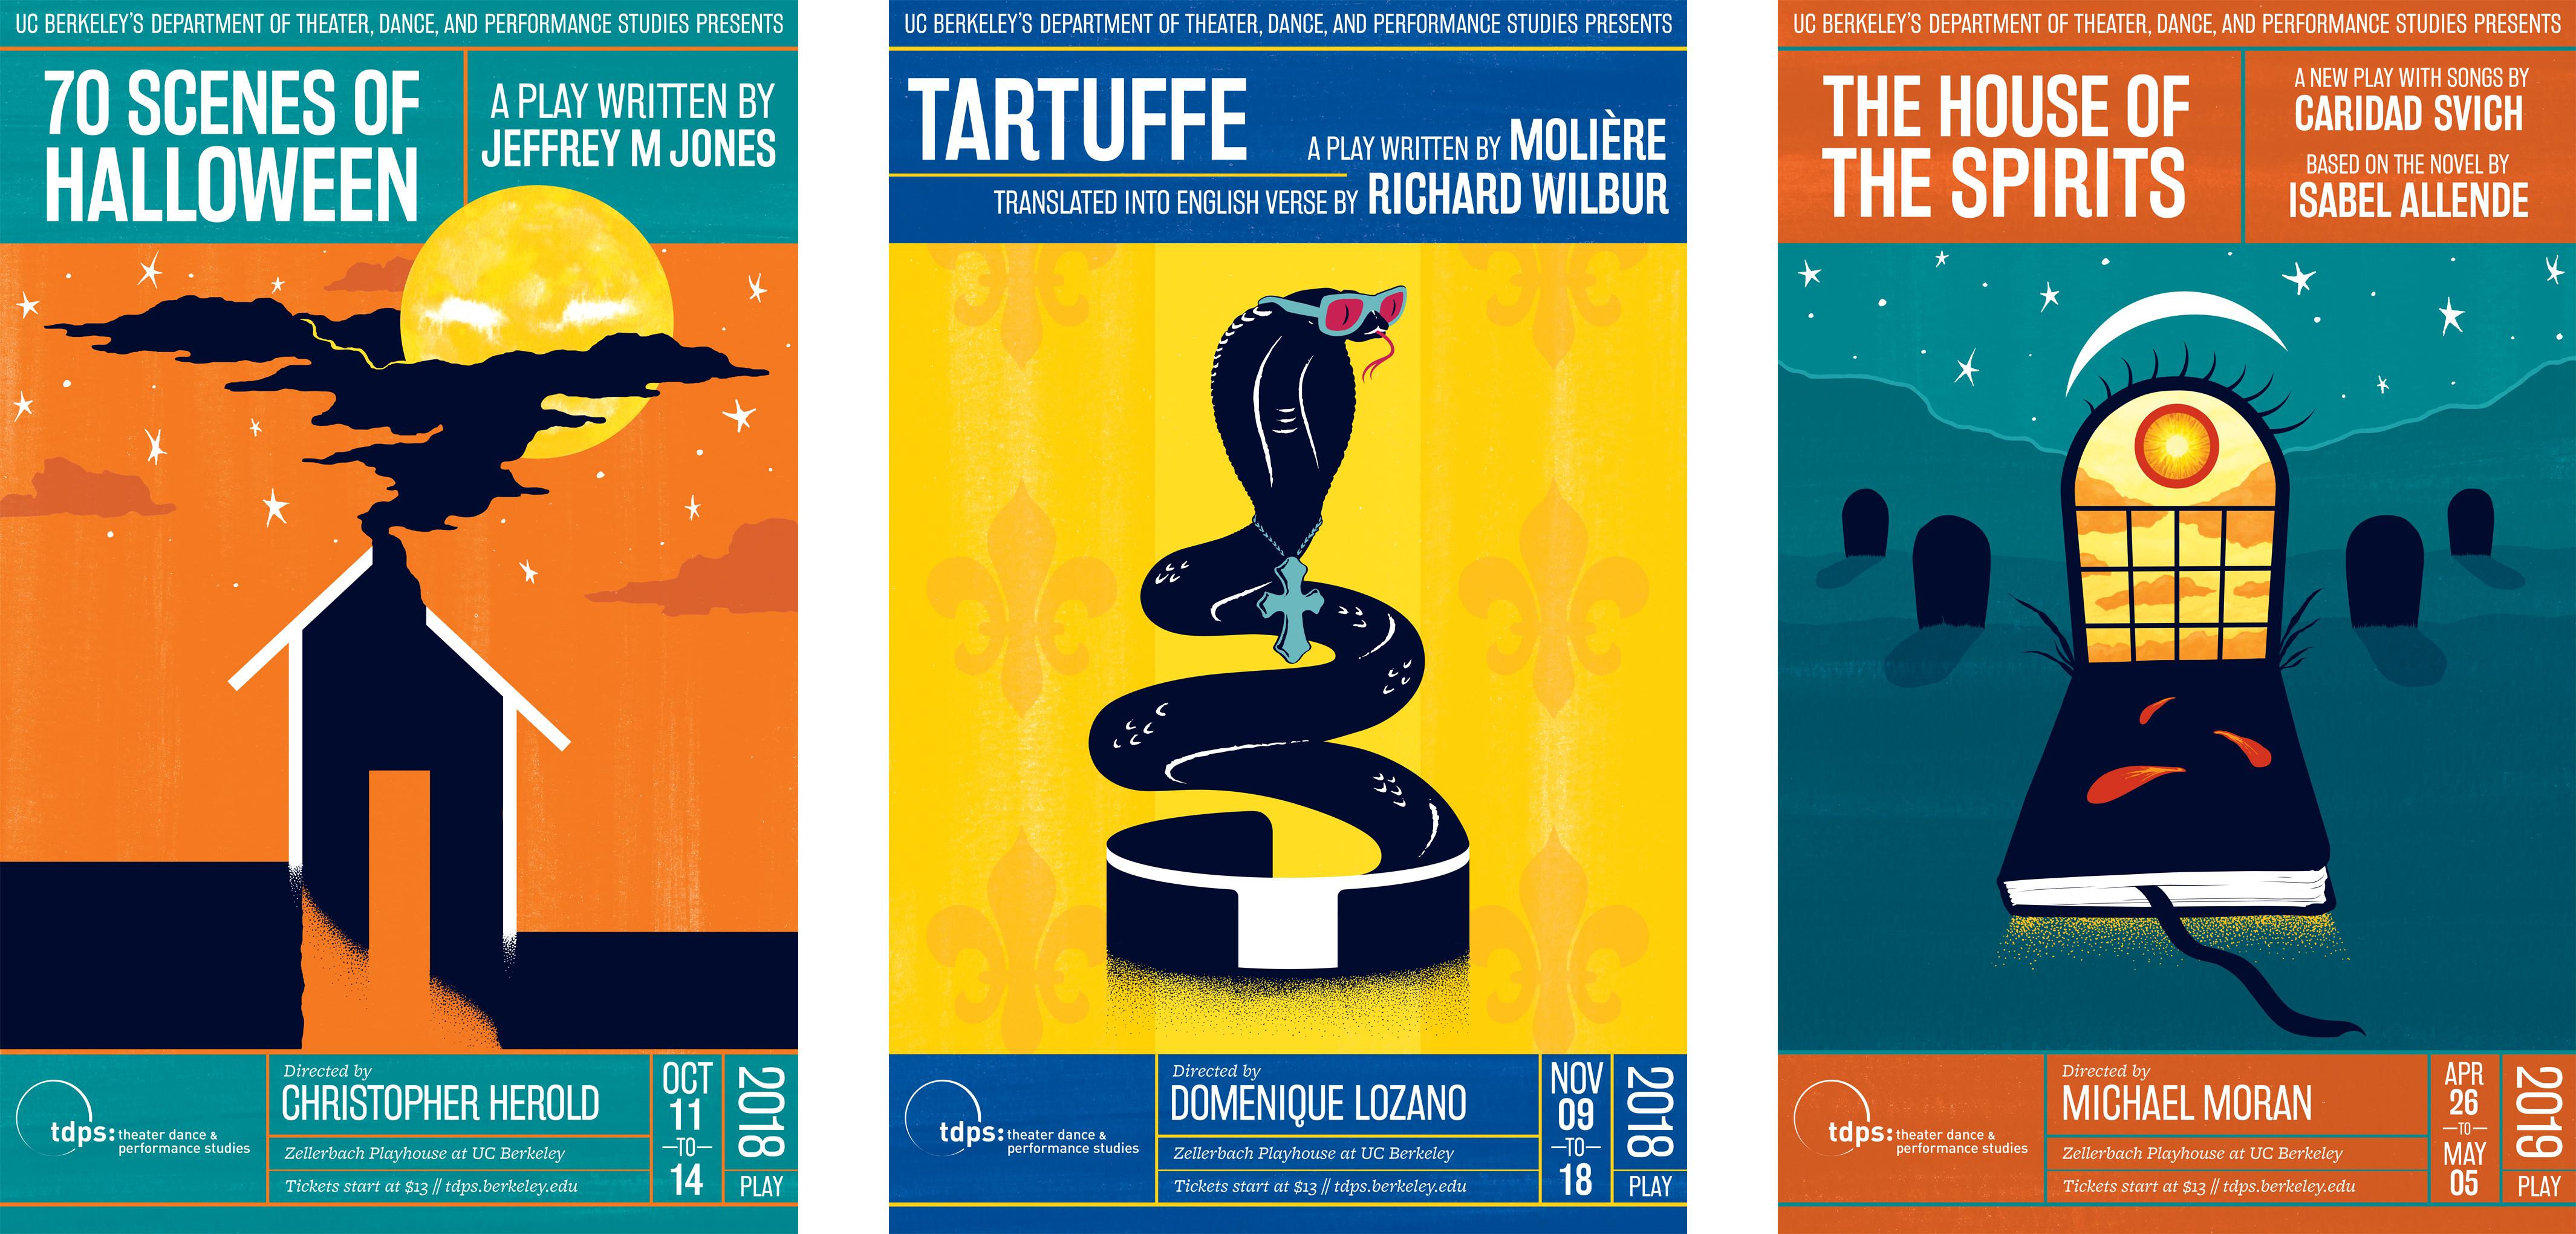 UC Berkeley TDPS 2018–19 Performance Season Posters